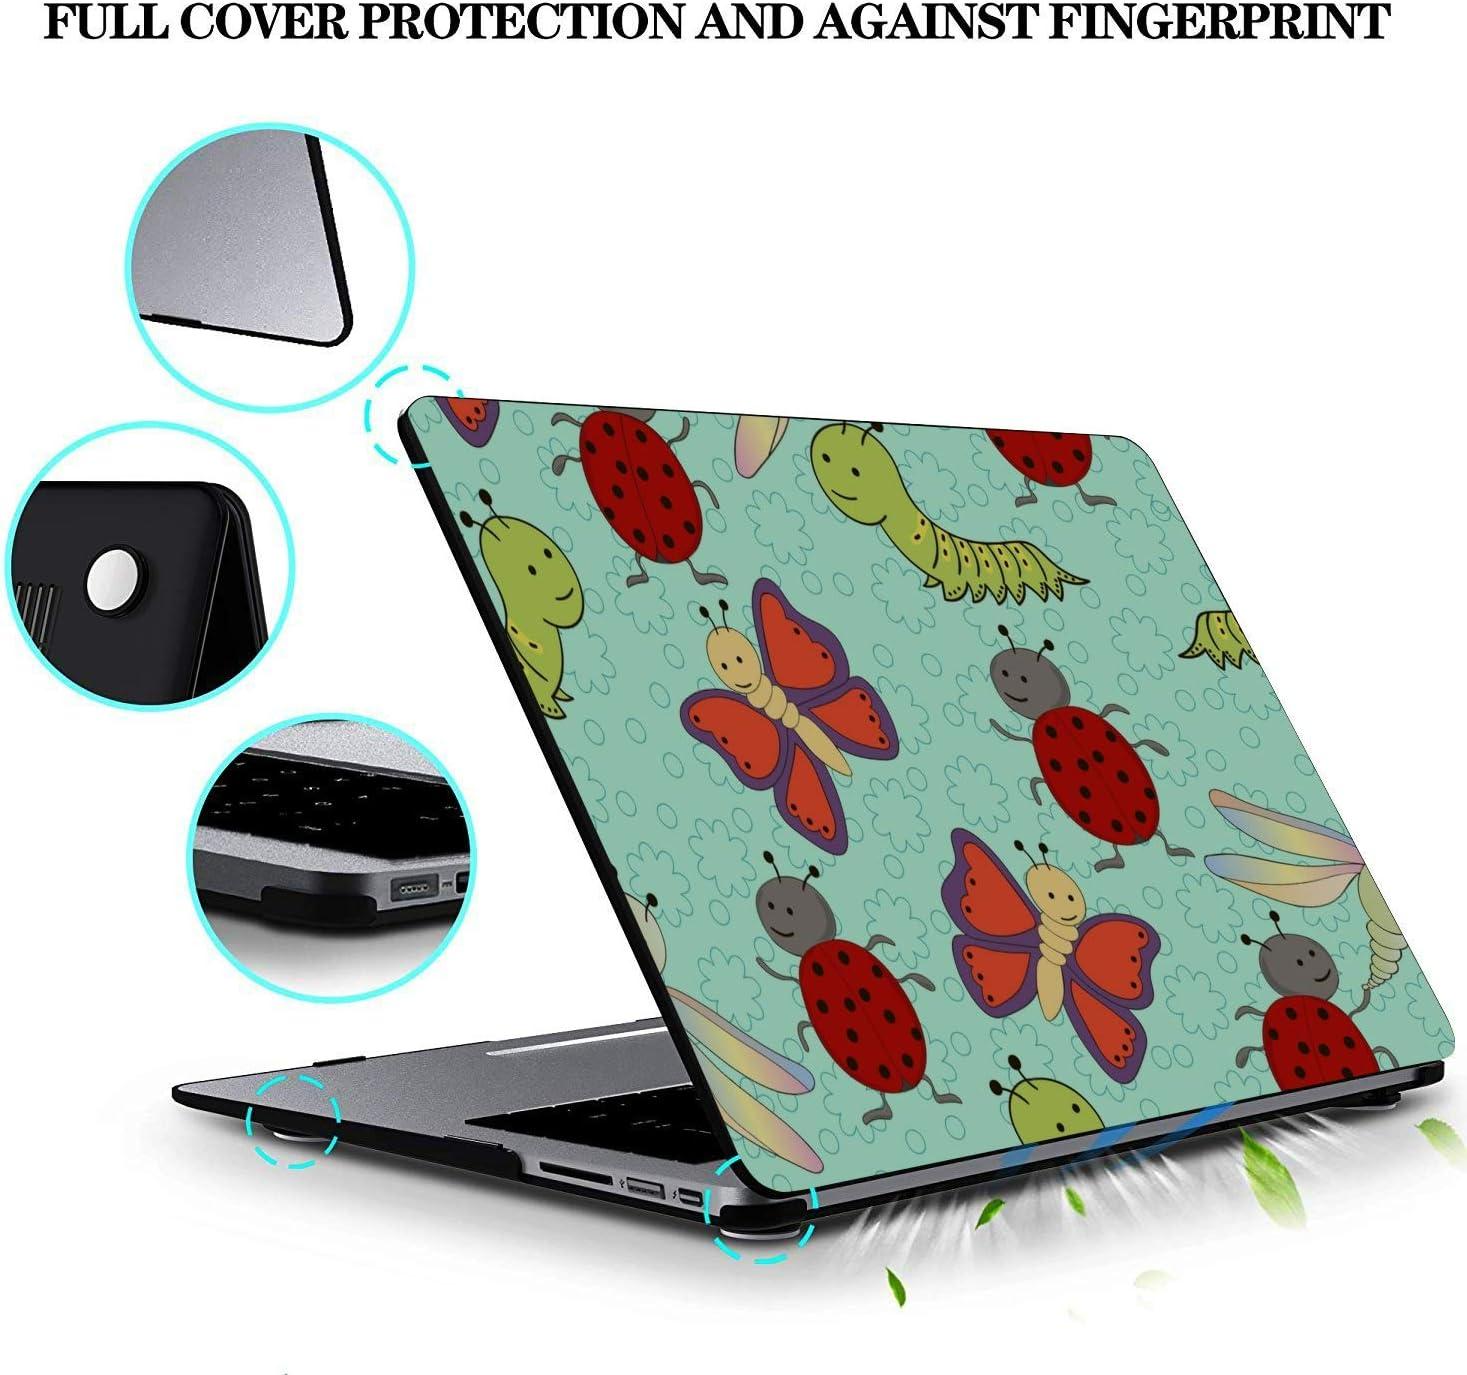 A1706 MacBook Pro Case Small Cute Cartoon Reptile Silkworm Plastic Hard Shell Compatible Mac Air 11 Pro 13 15 MacBook A1466 Case Protection for MacBook 2016-2019 Version